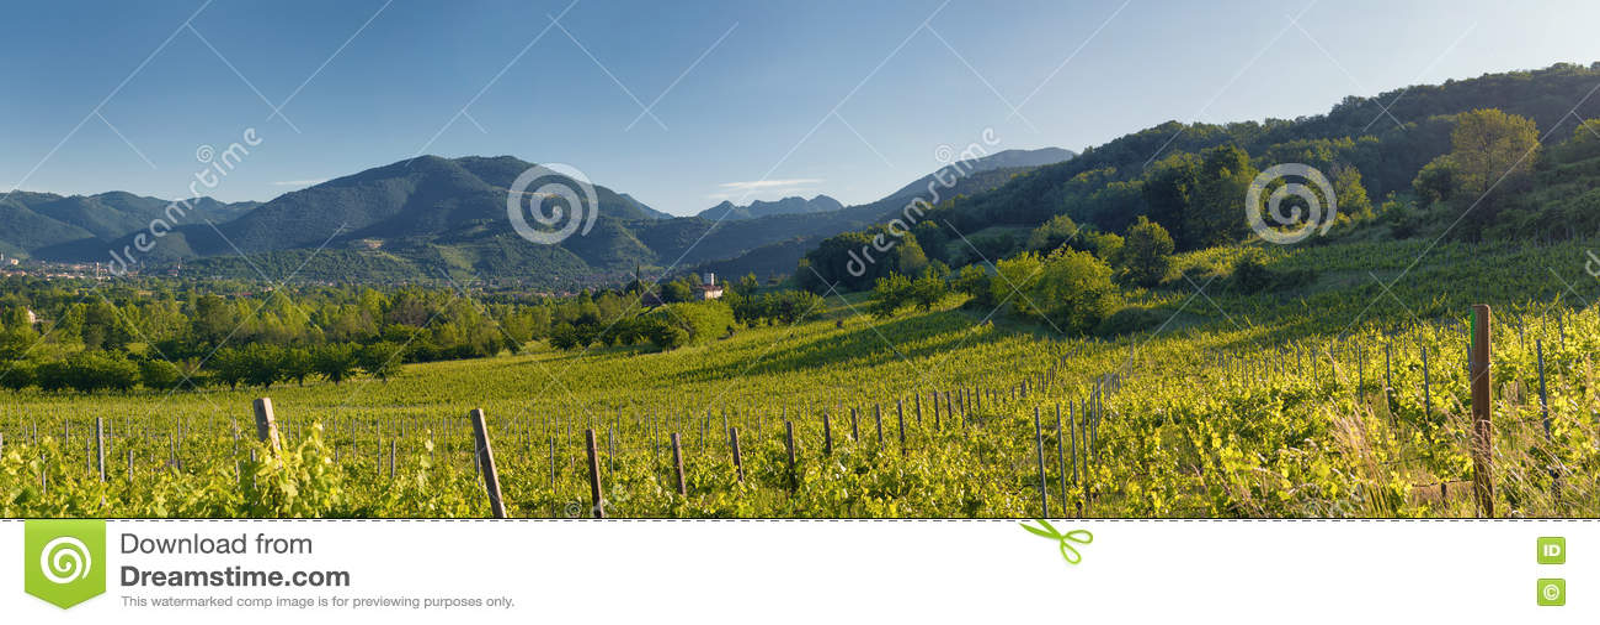 Heuvels en wineyards